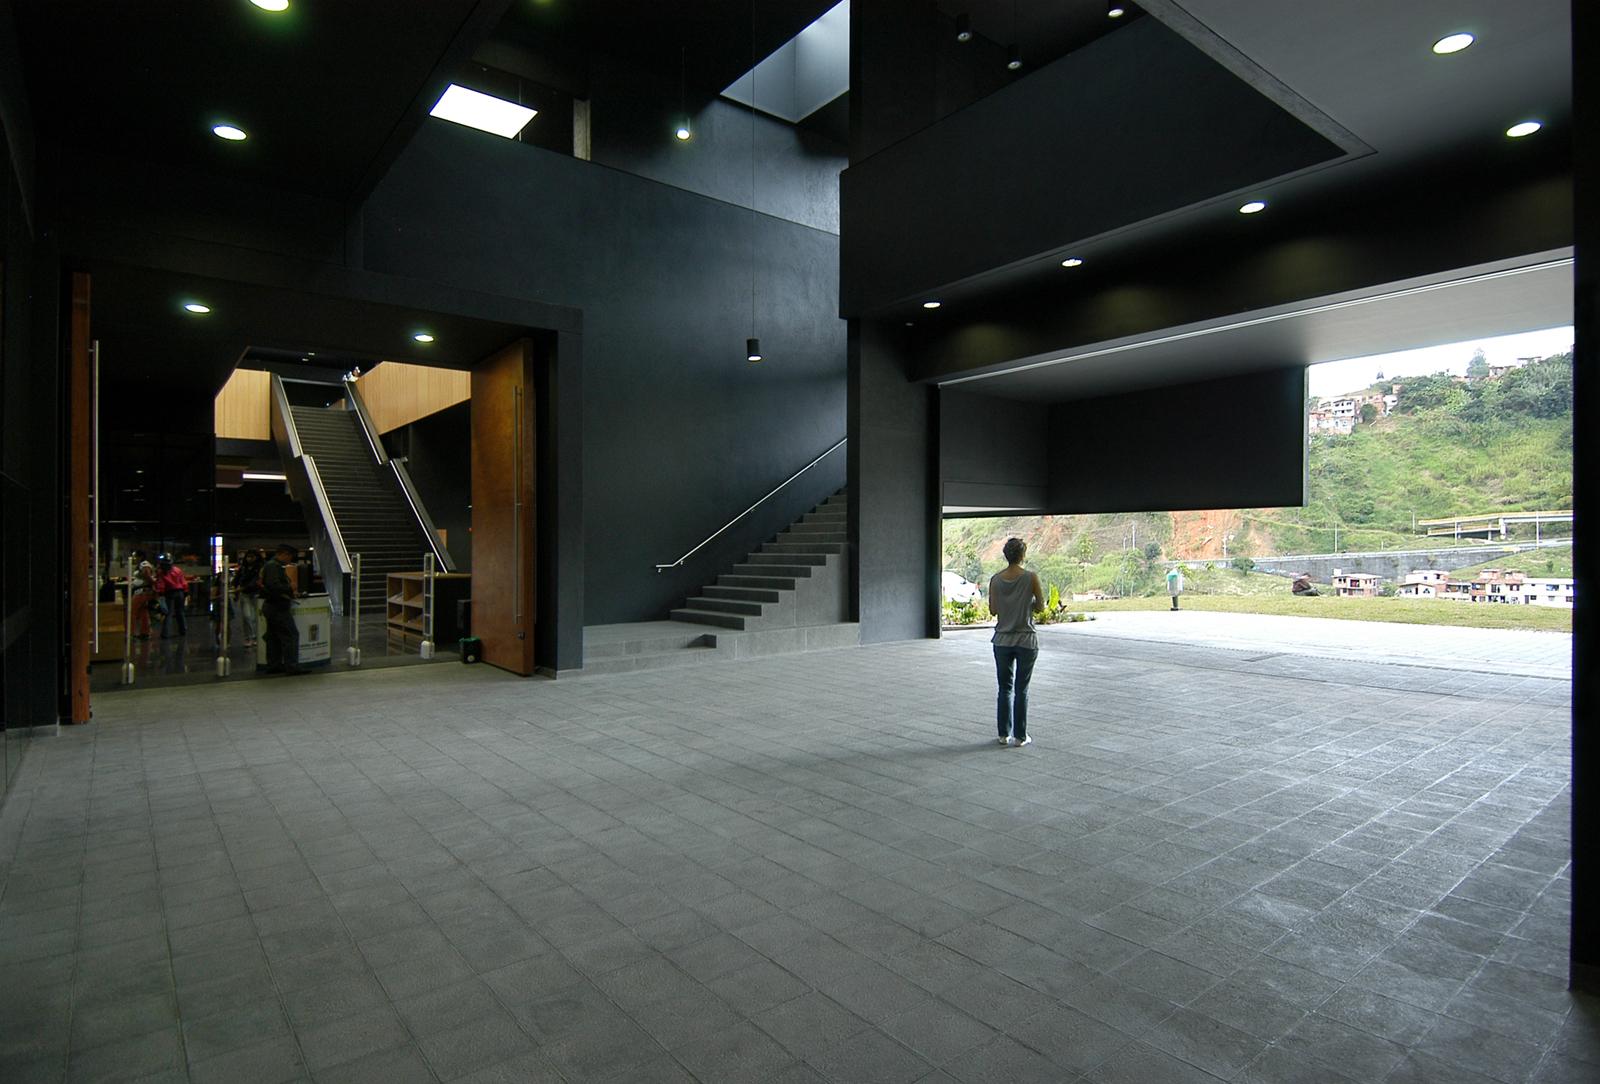 galeria de parque biblioteca fernando botero g ateliers architecture 4. Black Bedroom Furniture Sets. Home Design Ideas